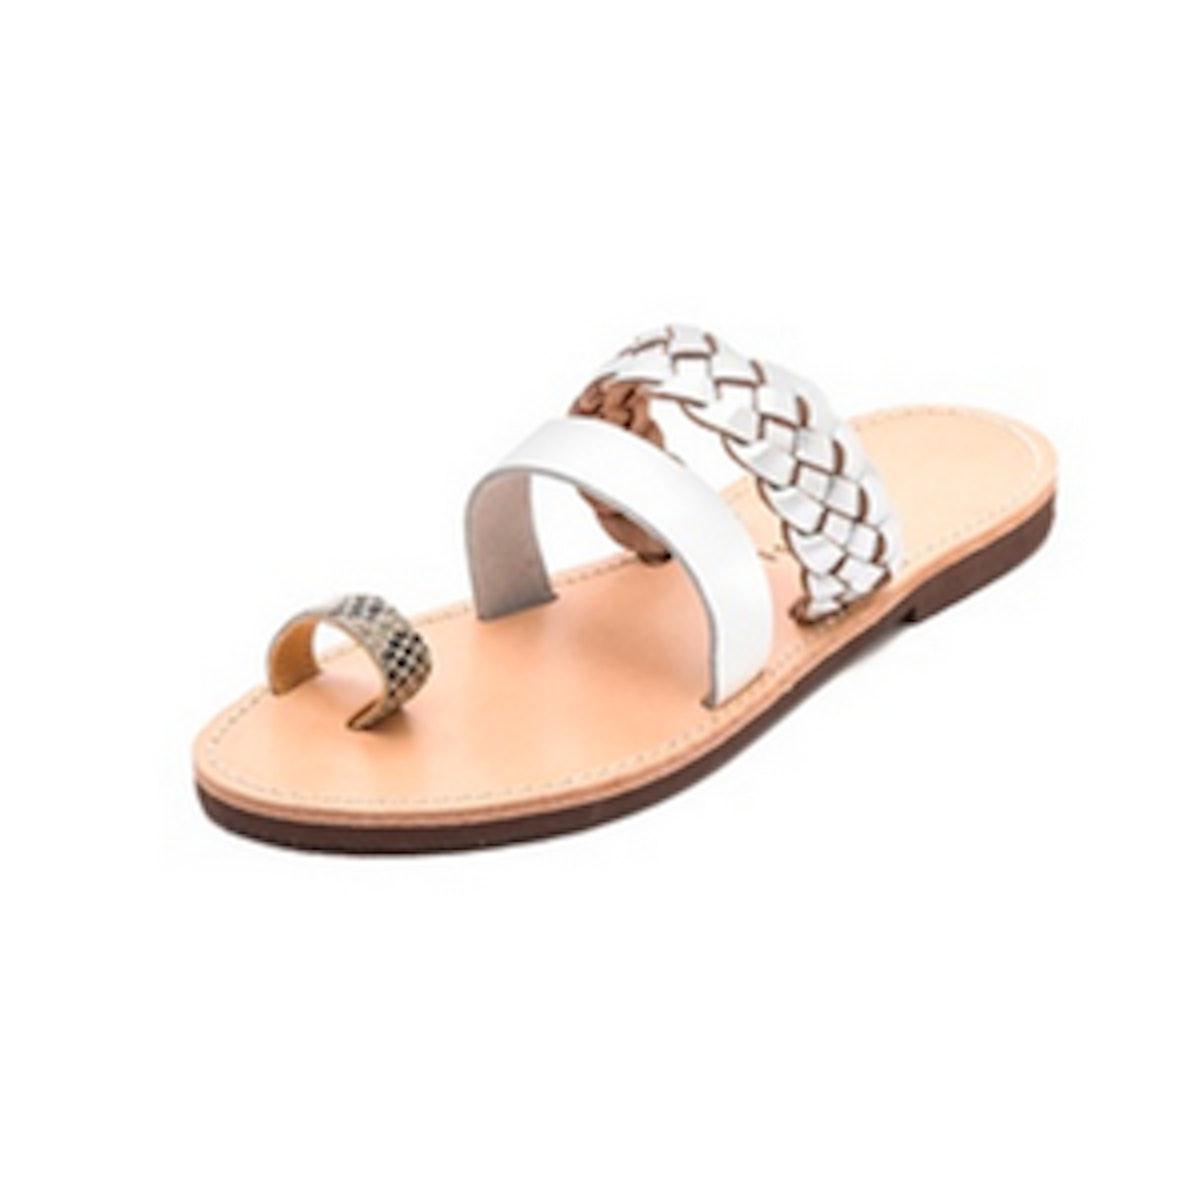 Iliotropio Two Band Sandals